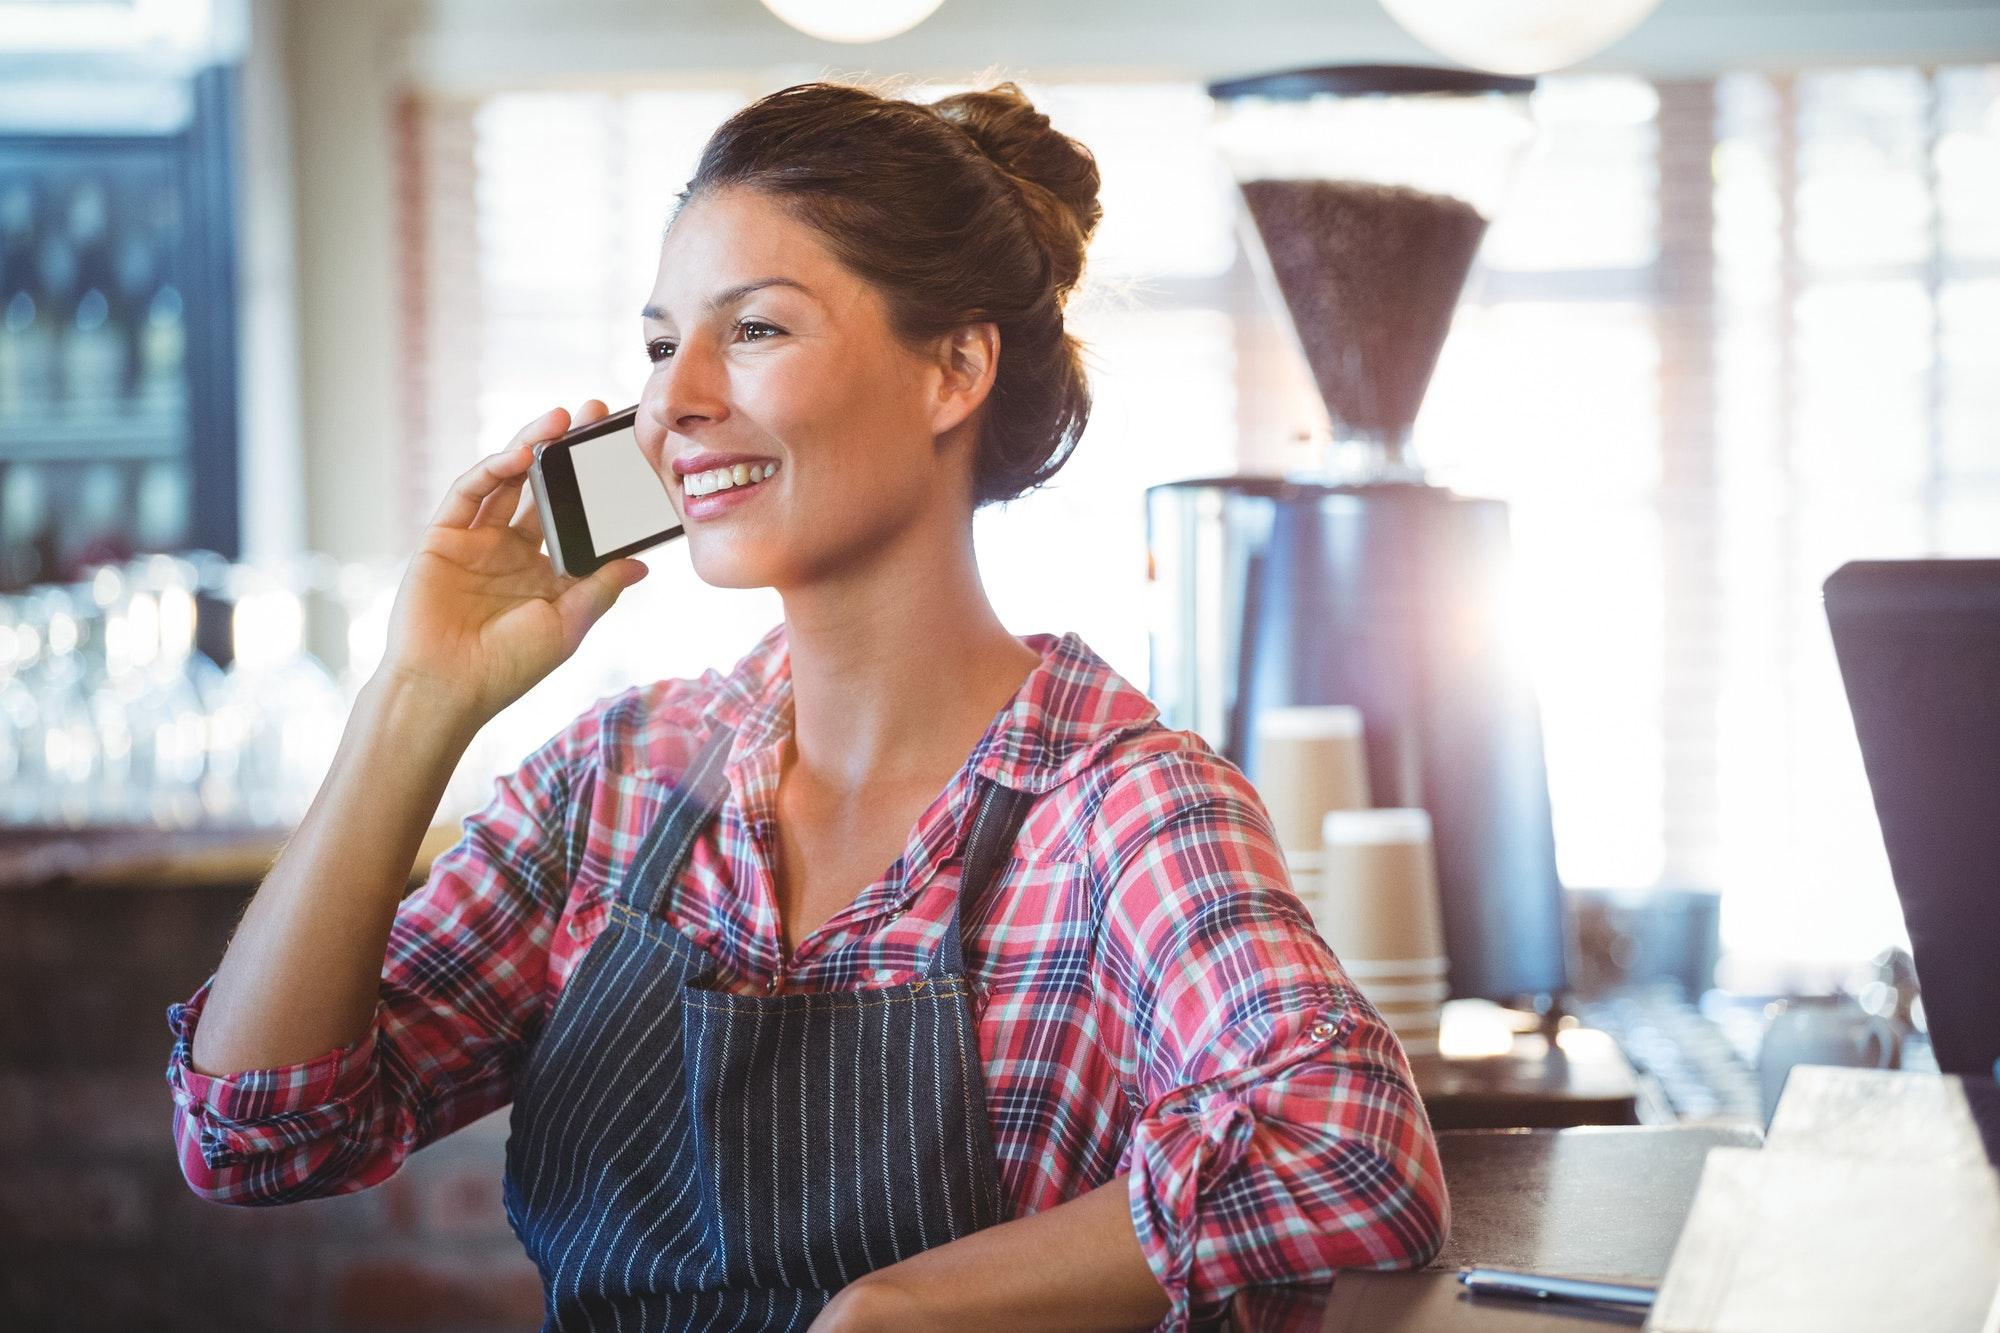 Waitress making a phone call